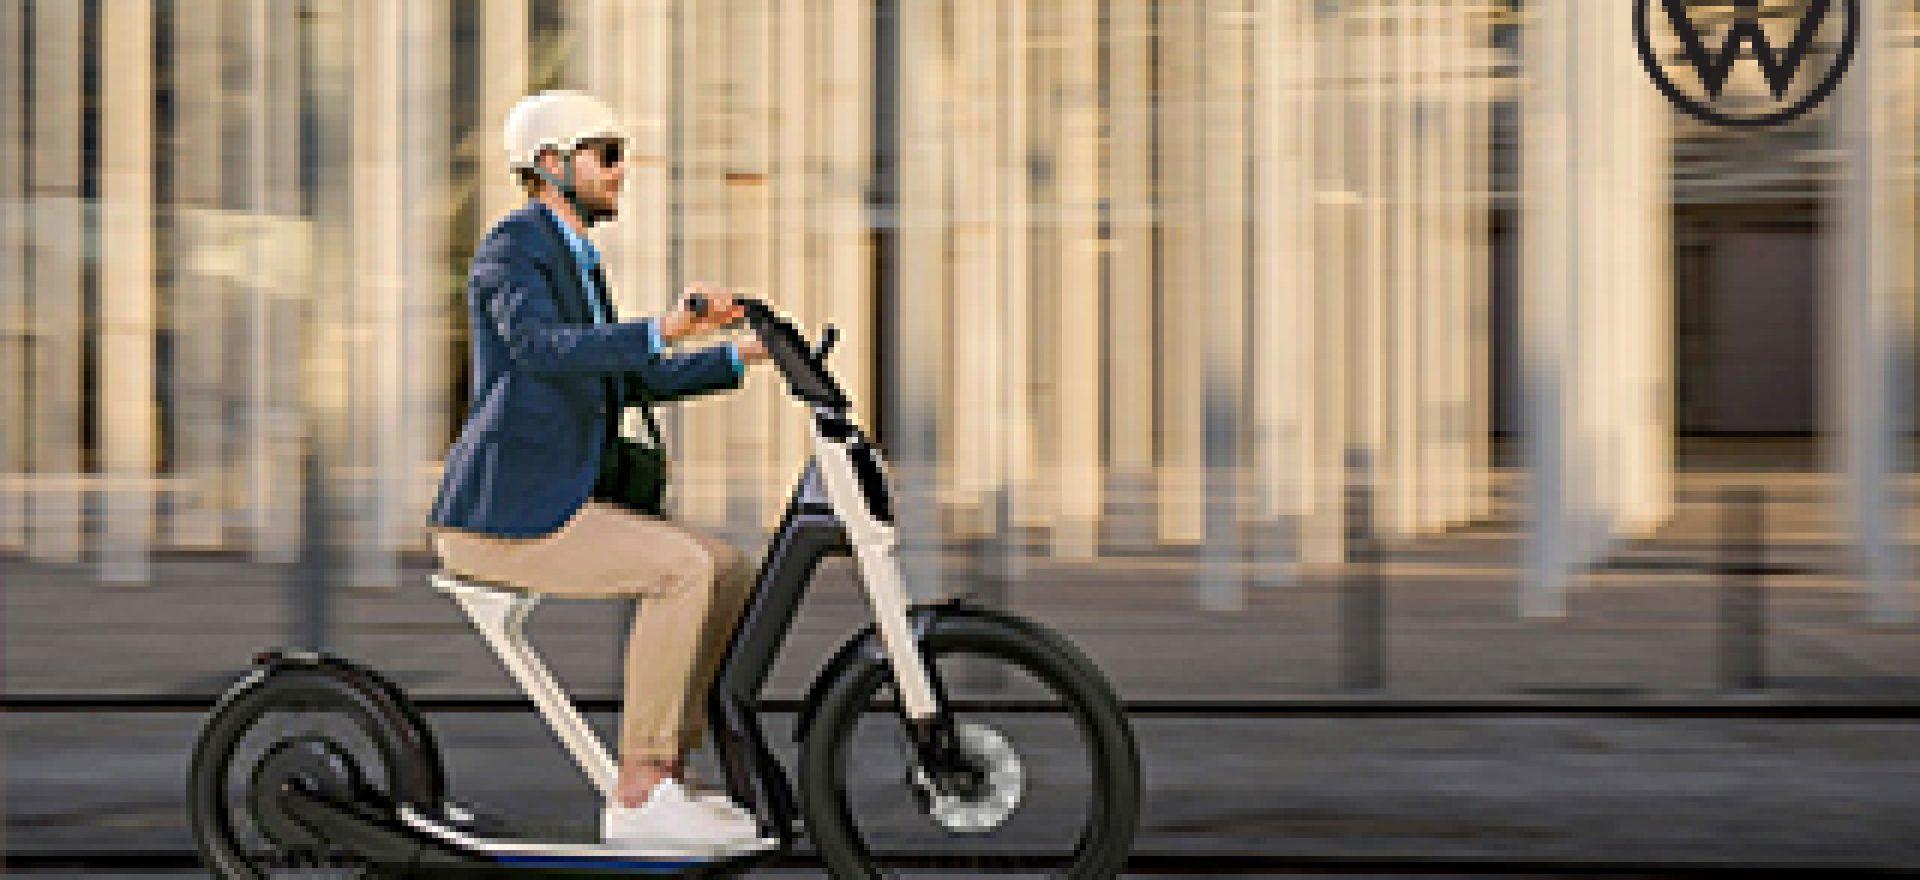 volkswagen-phat-trien-mau-scooter-chay-dien-moi-avatar